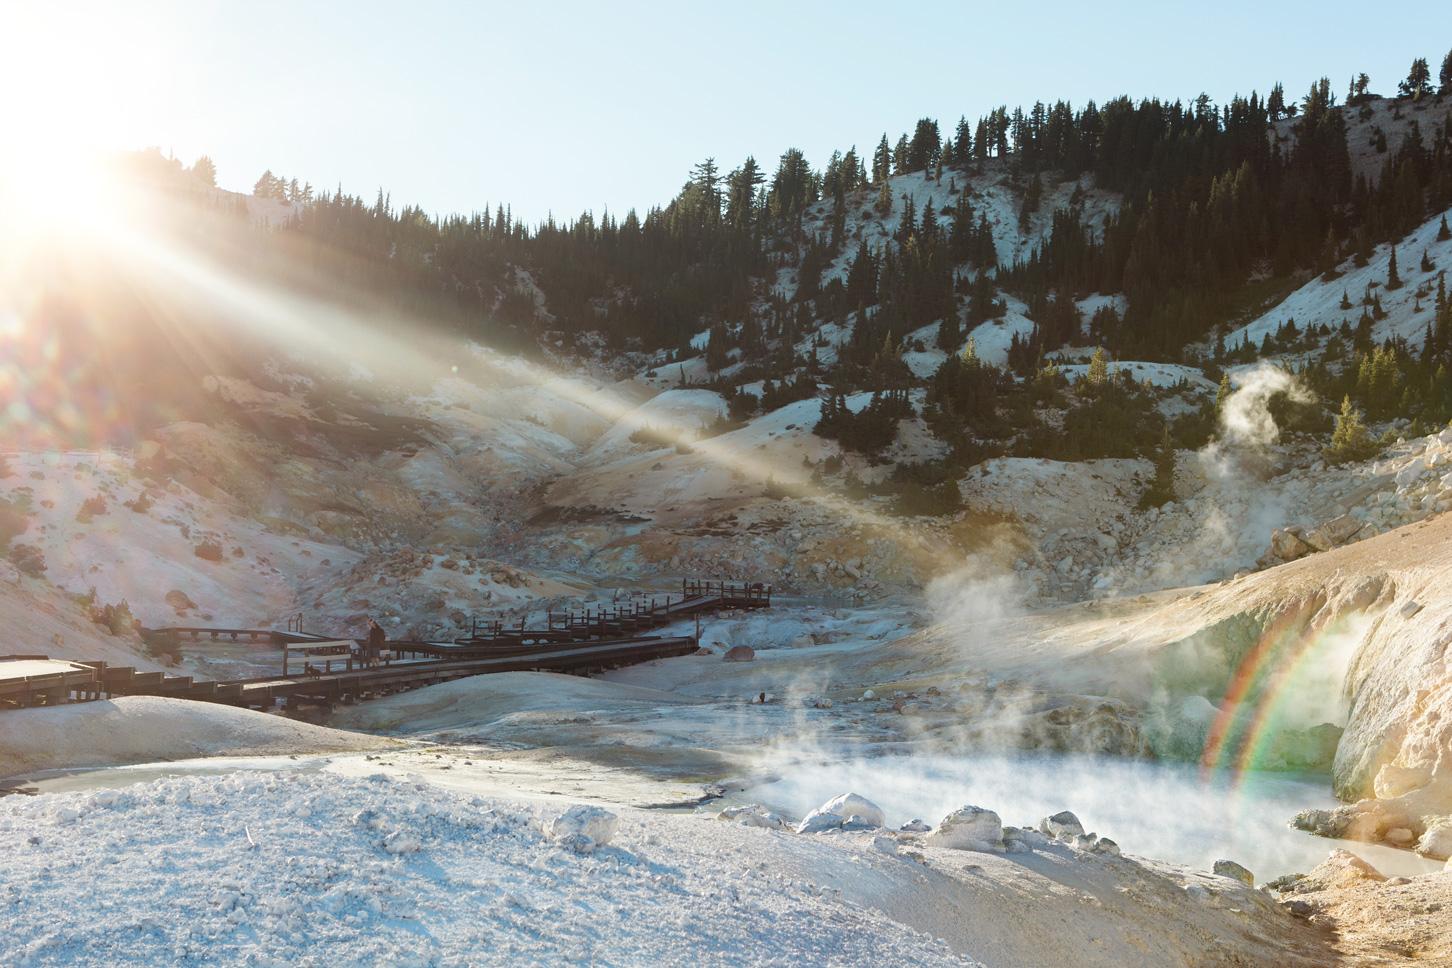 CindyGiovagnoli_Lassen_Volcanic_National_Park_California_camp_road_trip-012.jpg